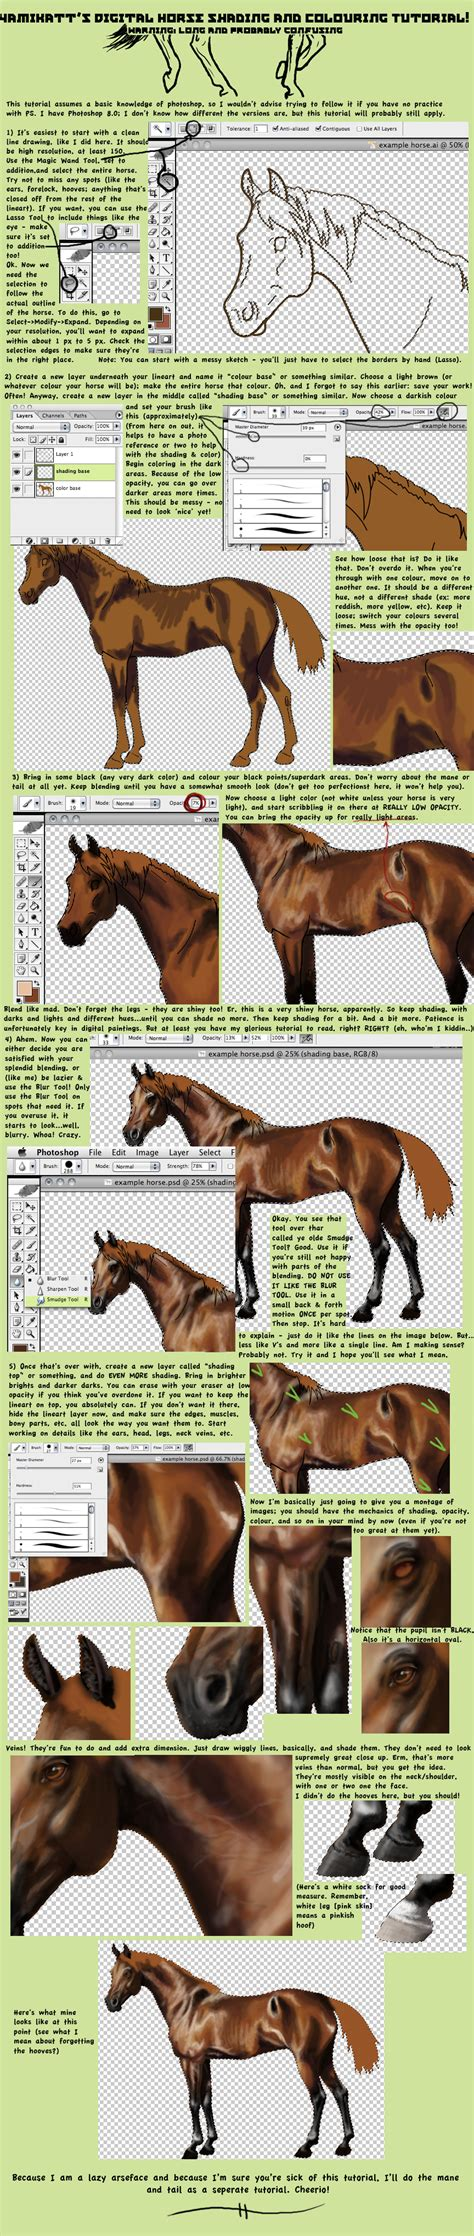 watercolor horse tutorial digital horse paintingtutorial by yamikatt on deviantart